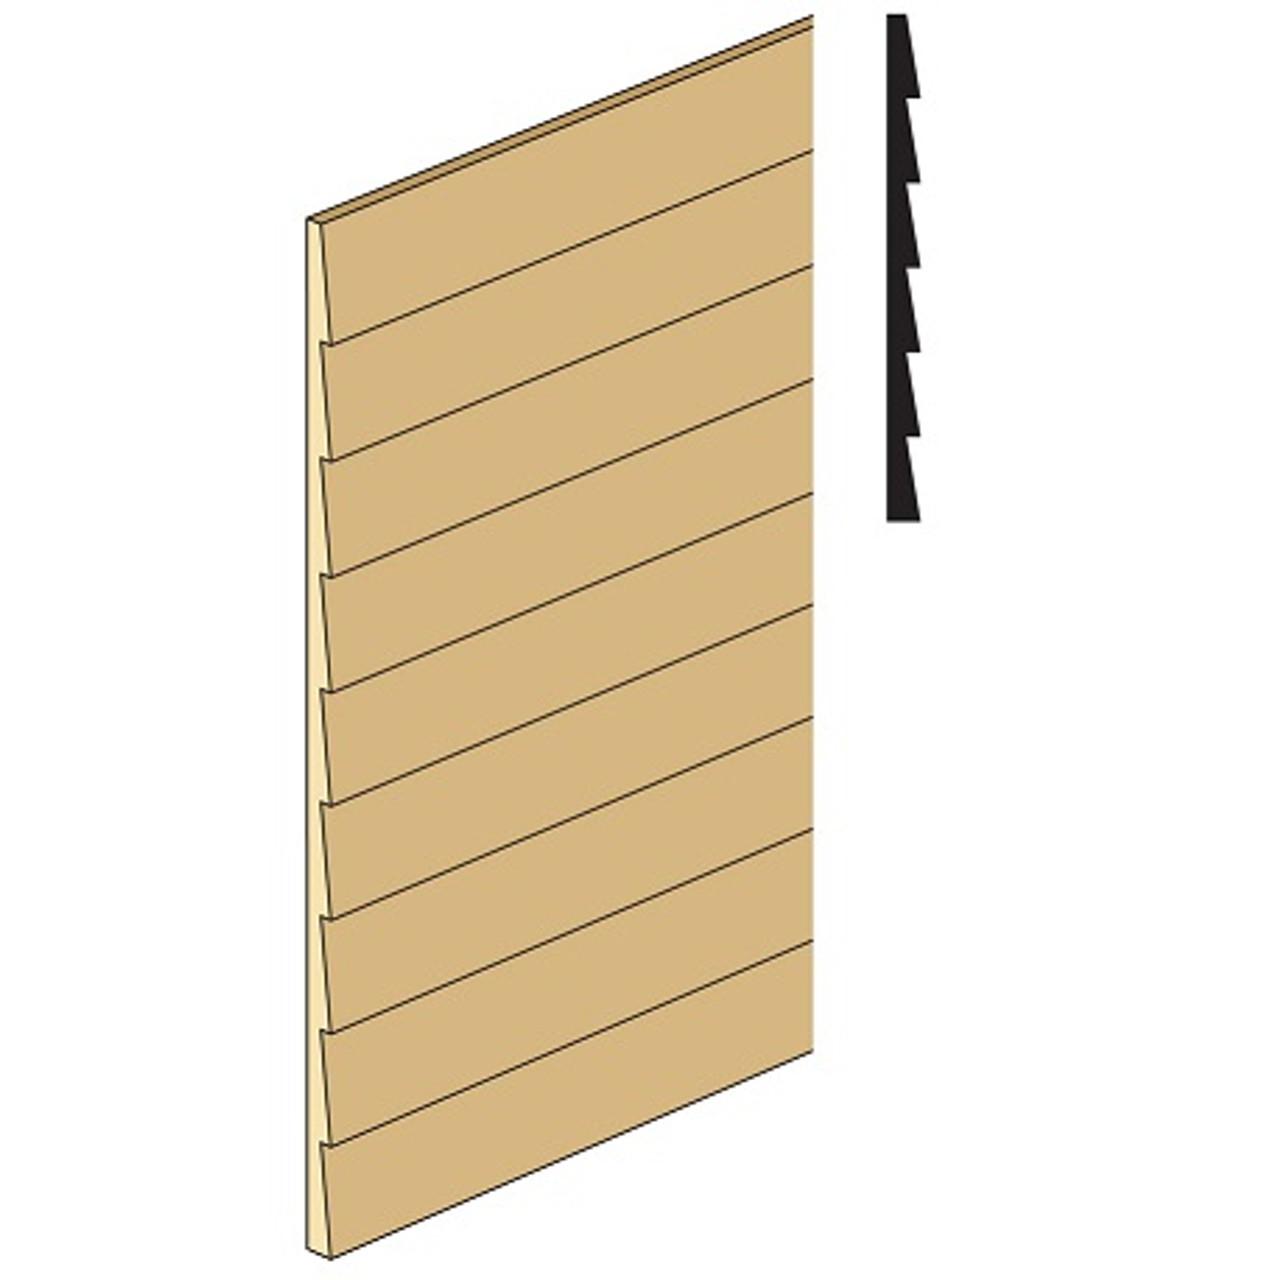 Northeastern Scale Lumber NE383 clapboard siding